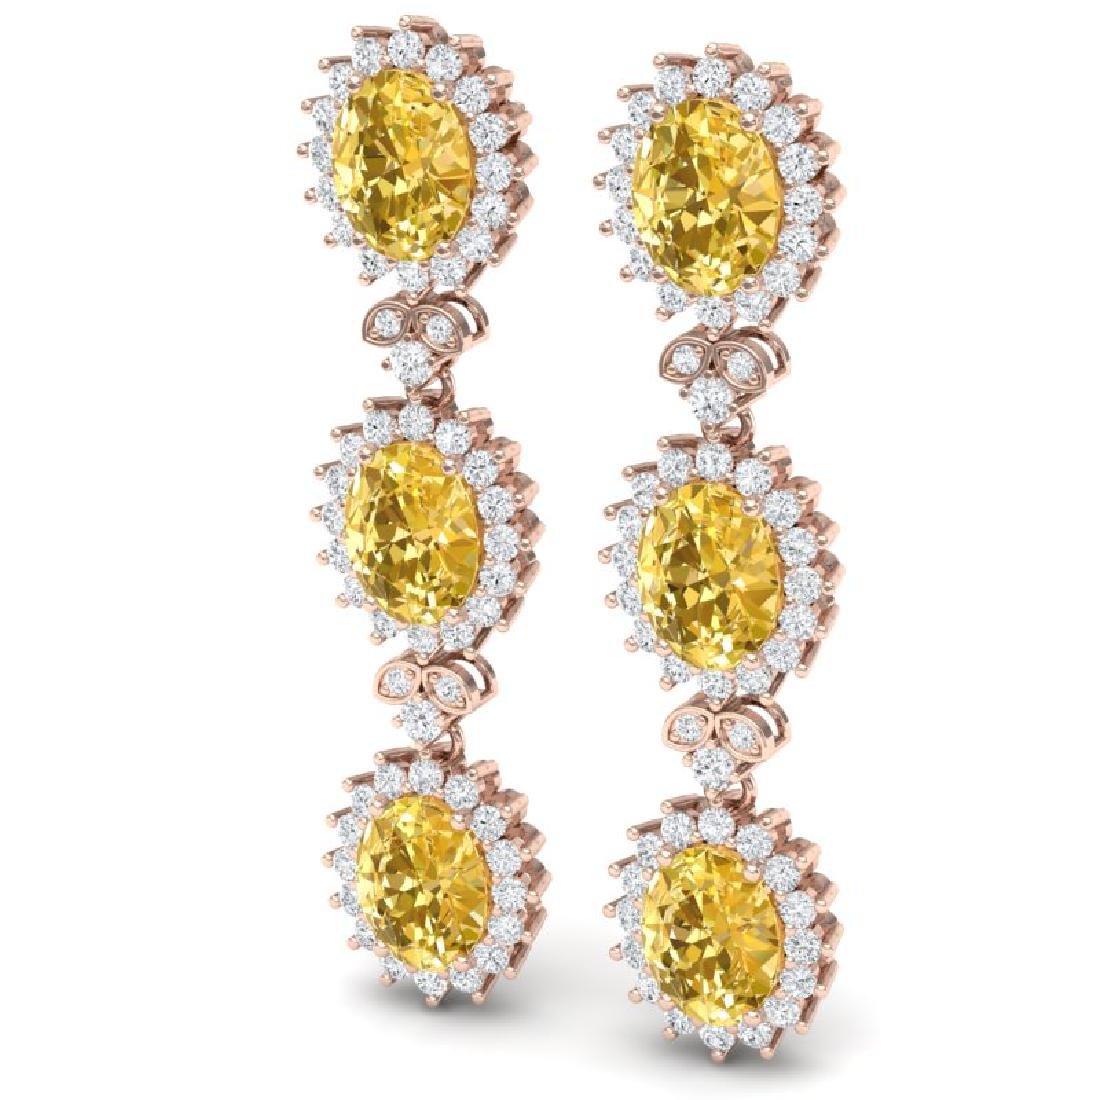 19.06 CTW Royalty Canary Citrine & VS Diamond Earrings - 2